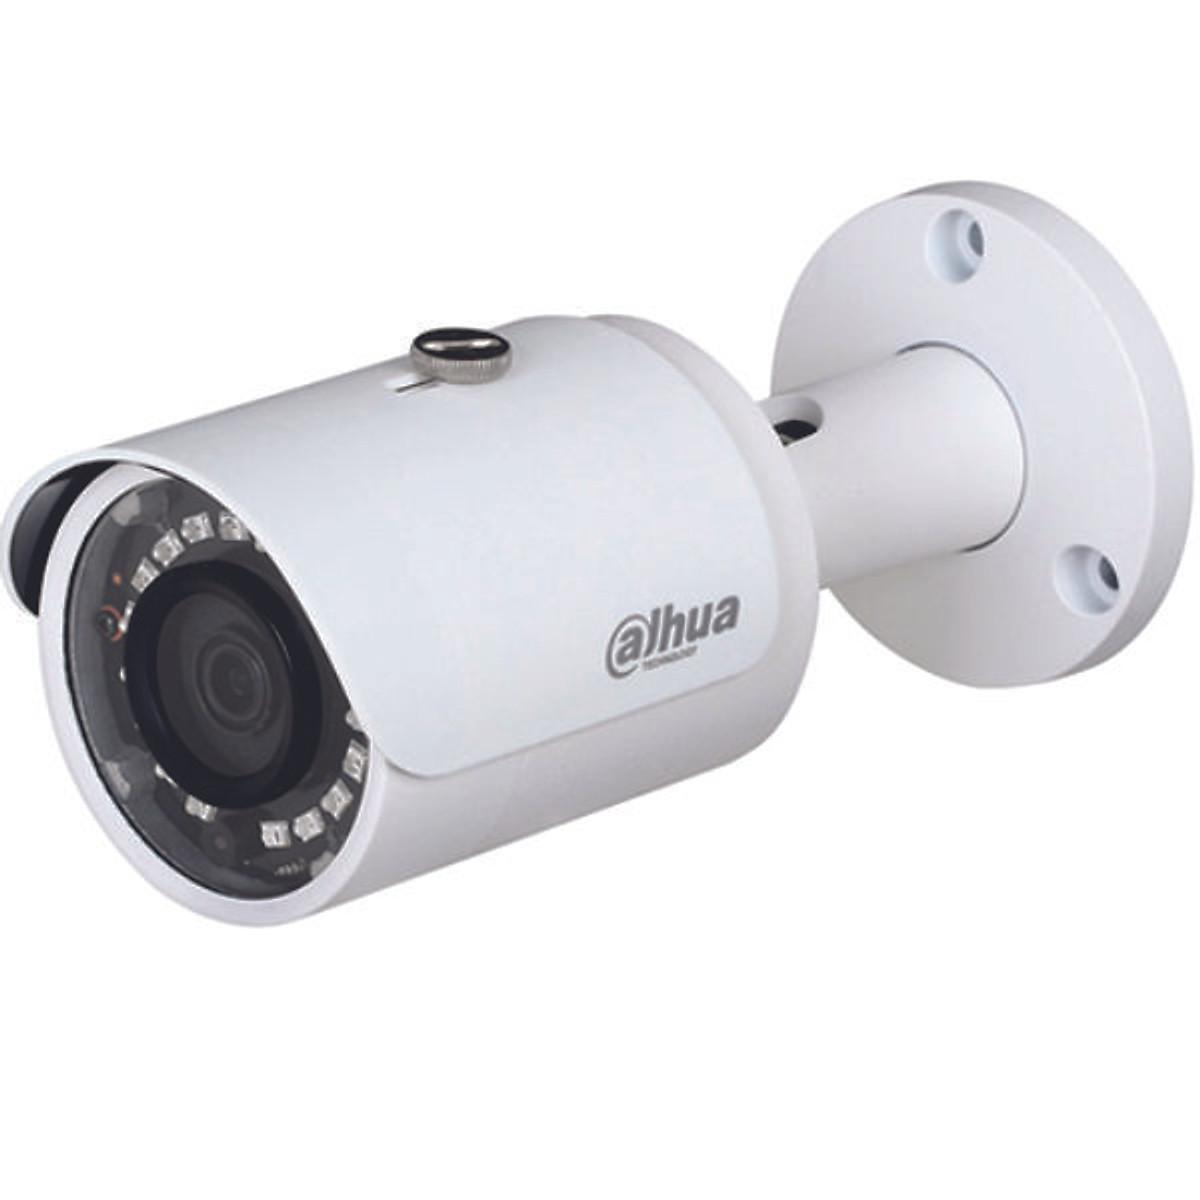 Camera Quan Sát CVI Dahua IPC-HFW1230SP-L – Hàng chính hãng